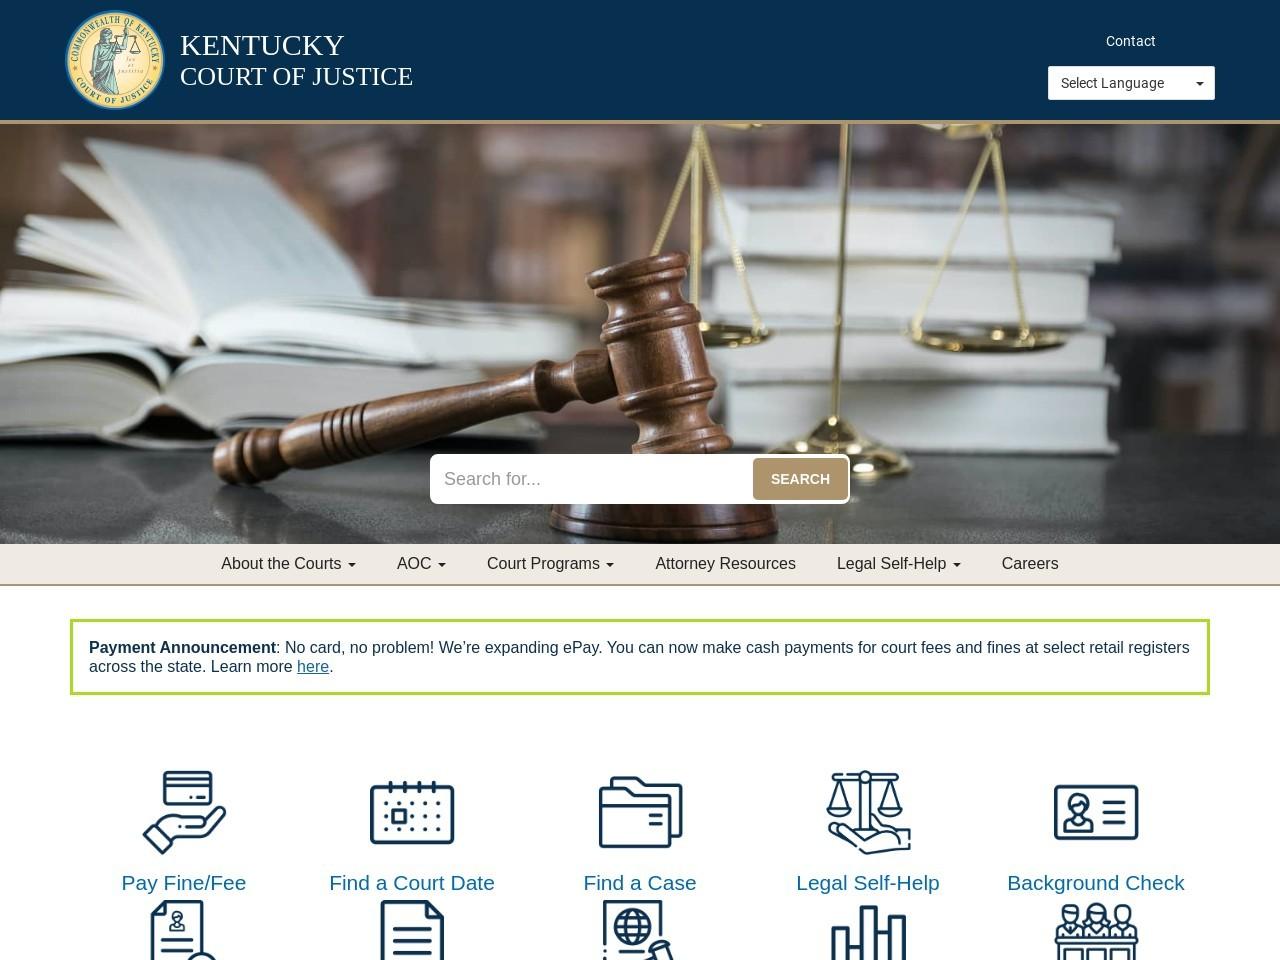 courts.ky.gov